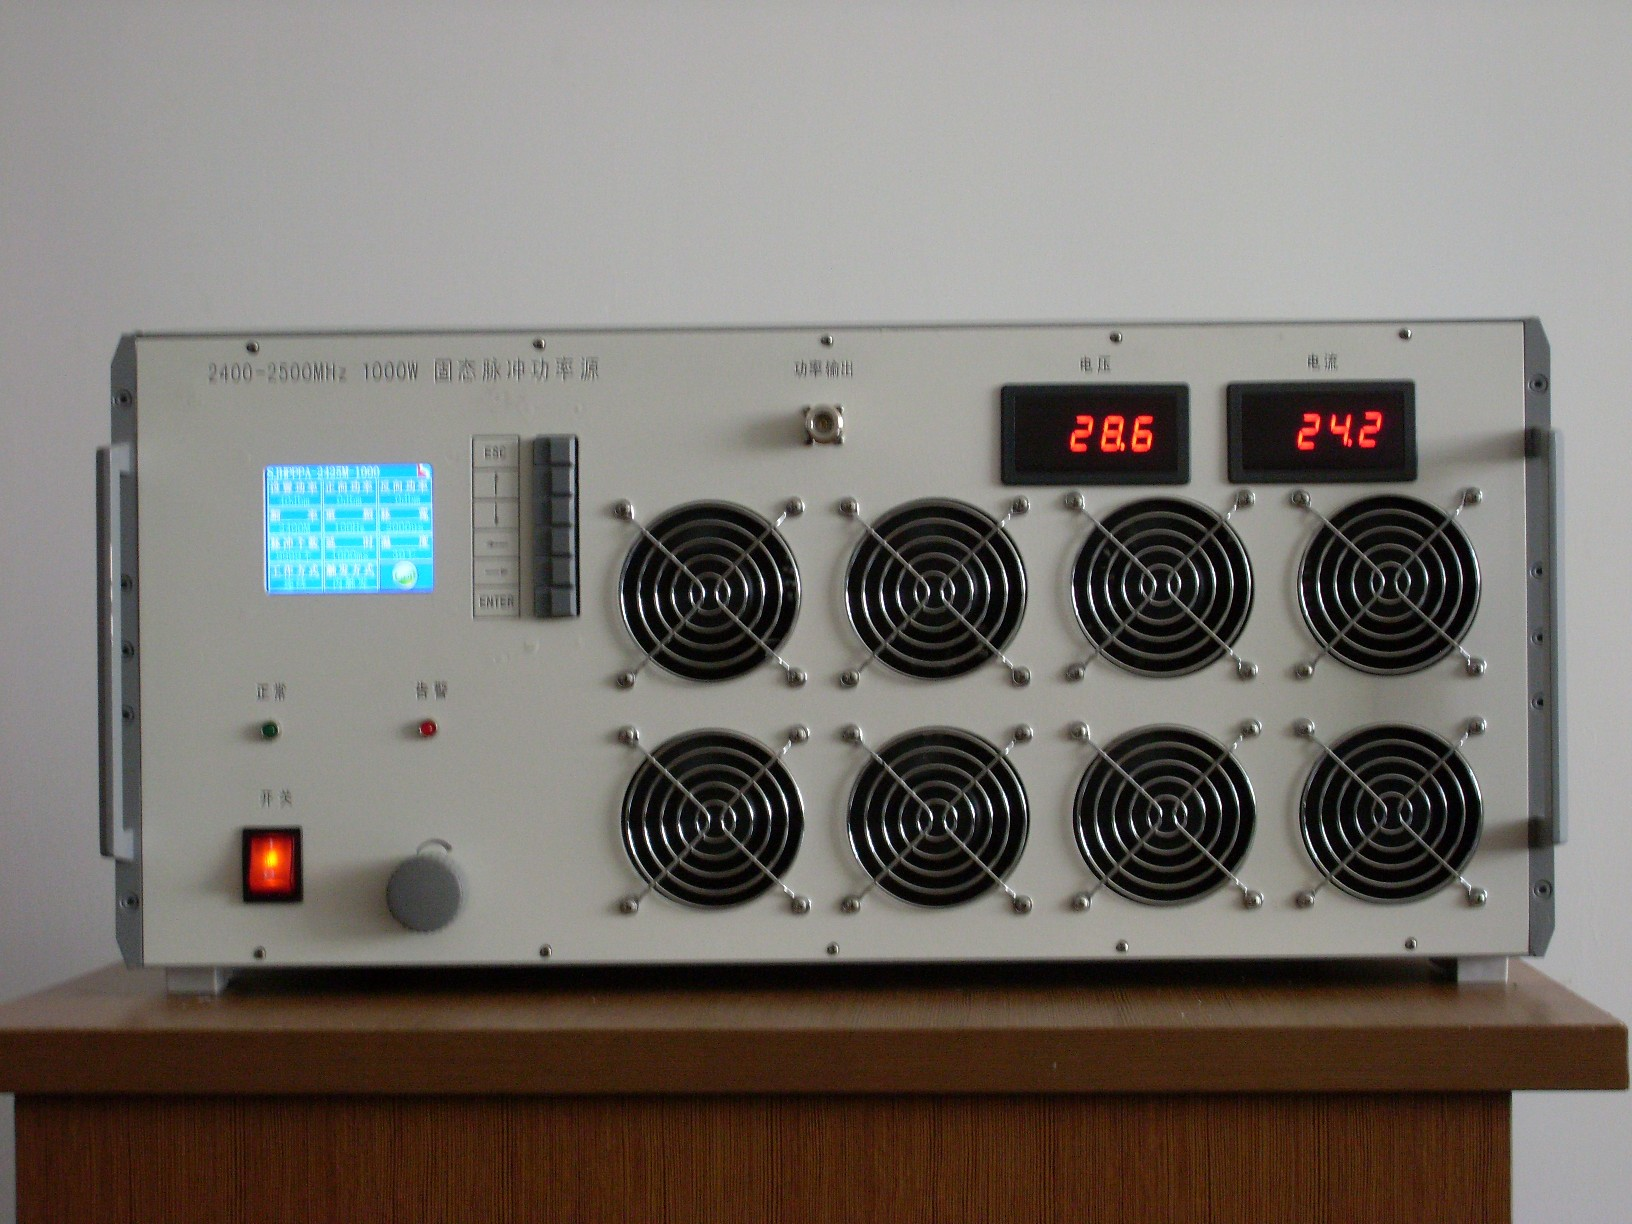 2400-2500MHz 1000W脉冲抓饭直播篮球直播